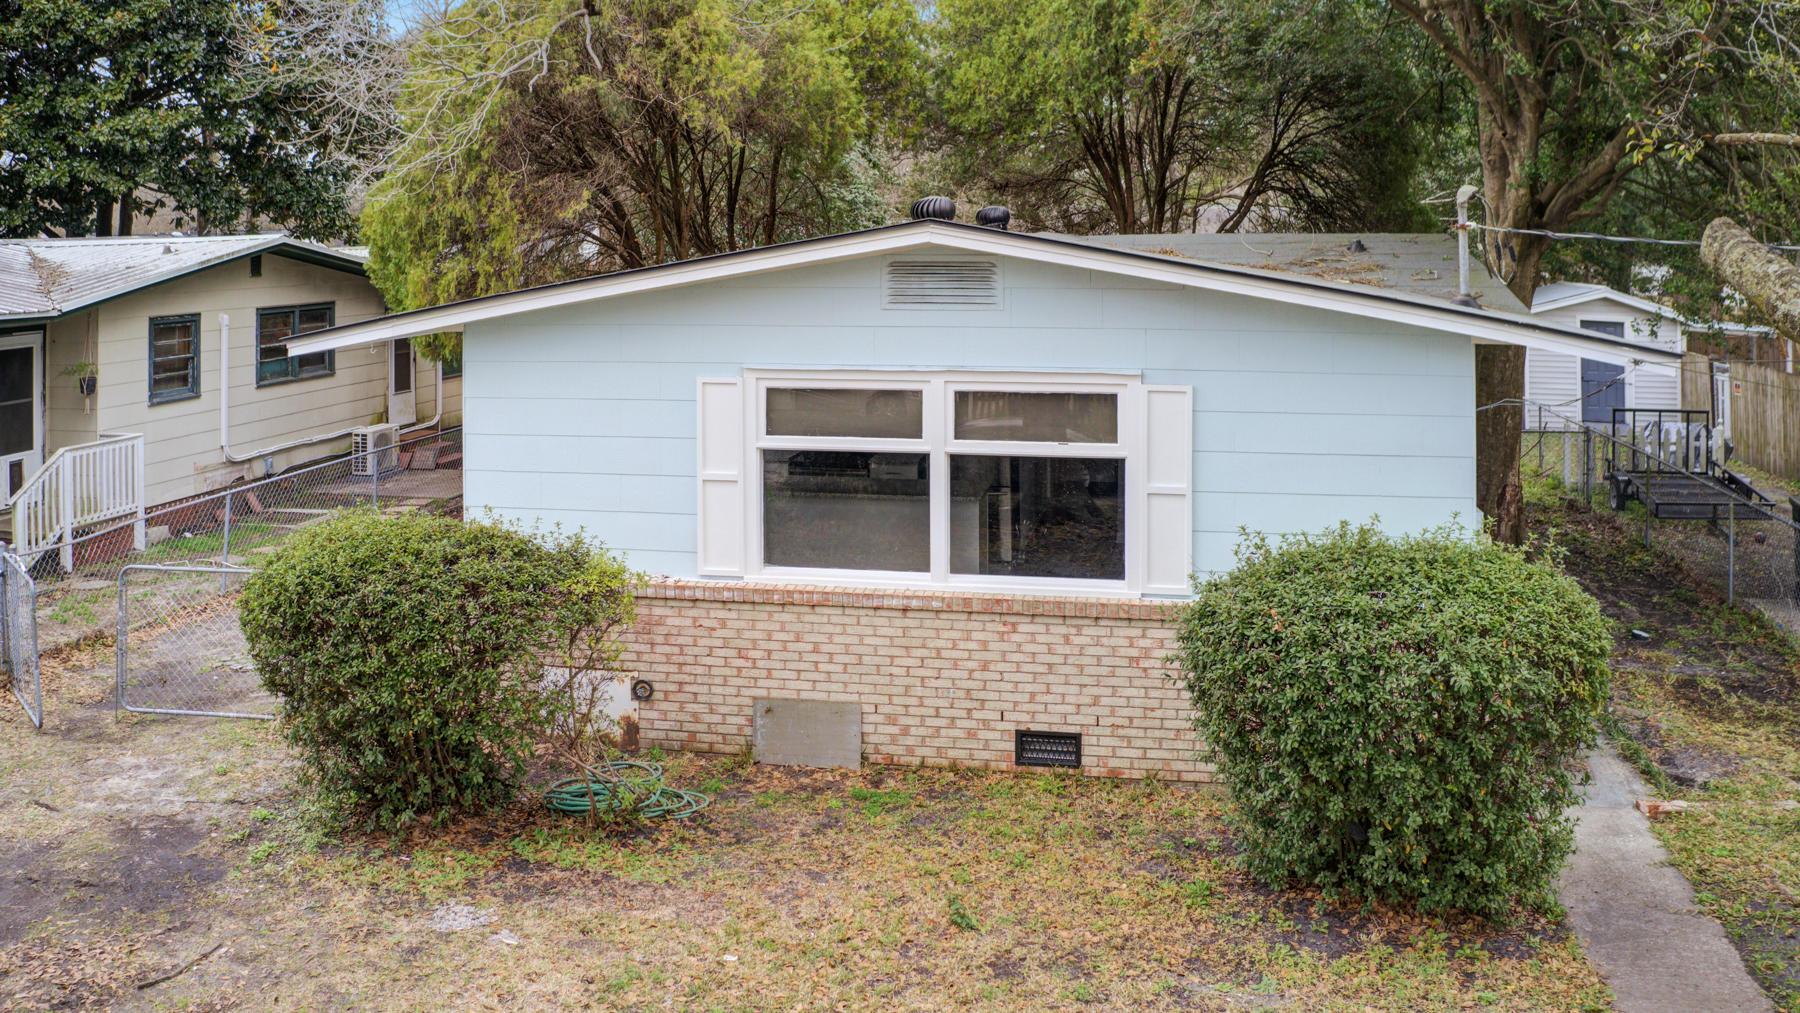 Port Park Homes For Sale - 5820 Sledge, Hanahan, SC - 7